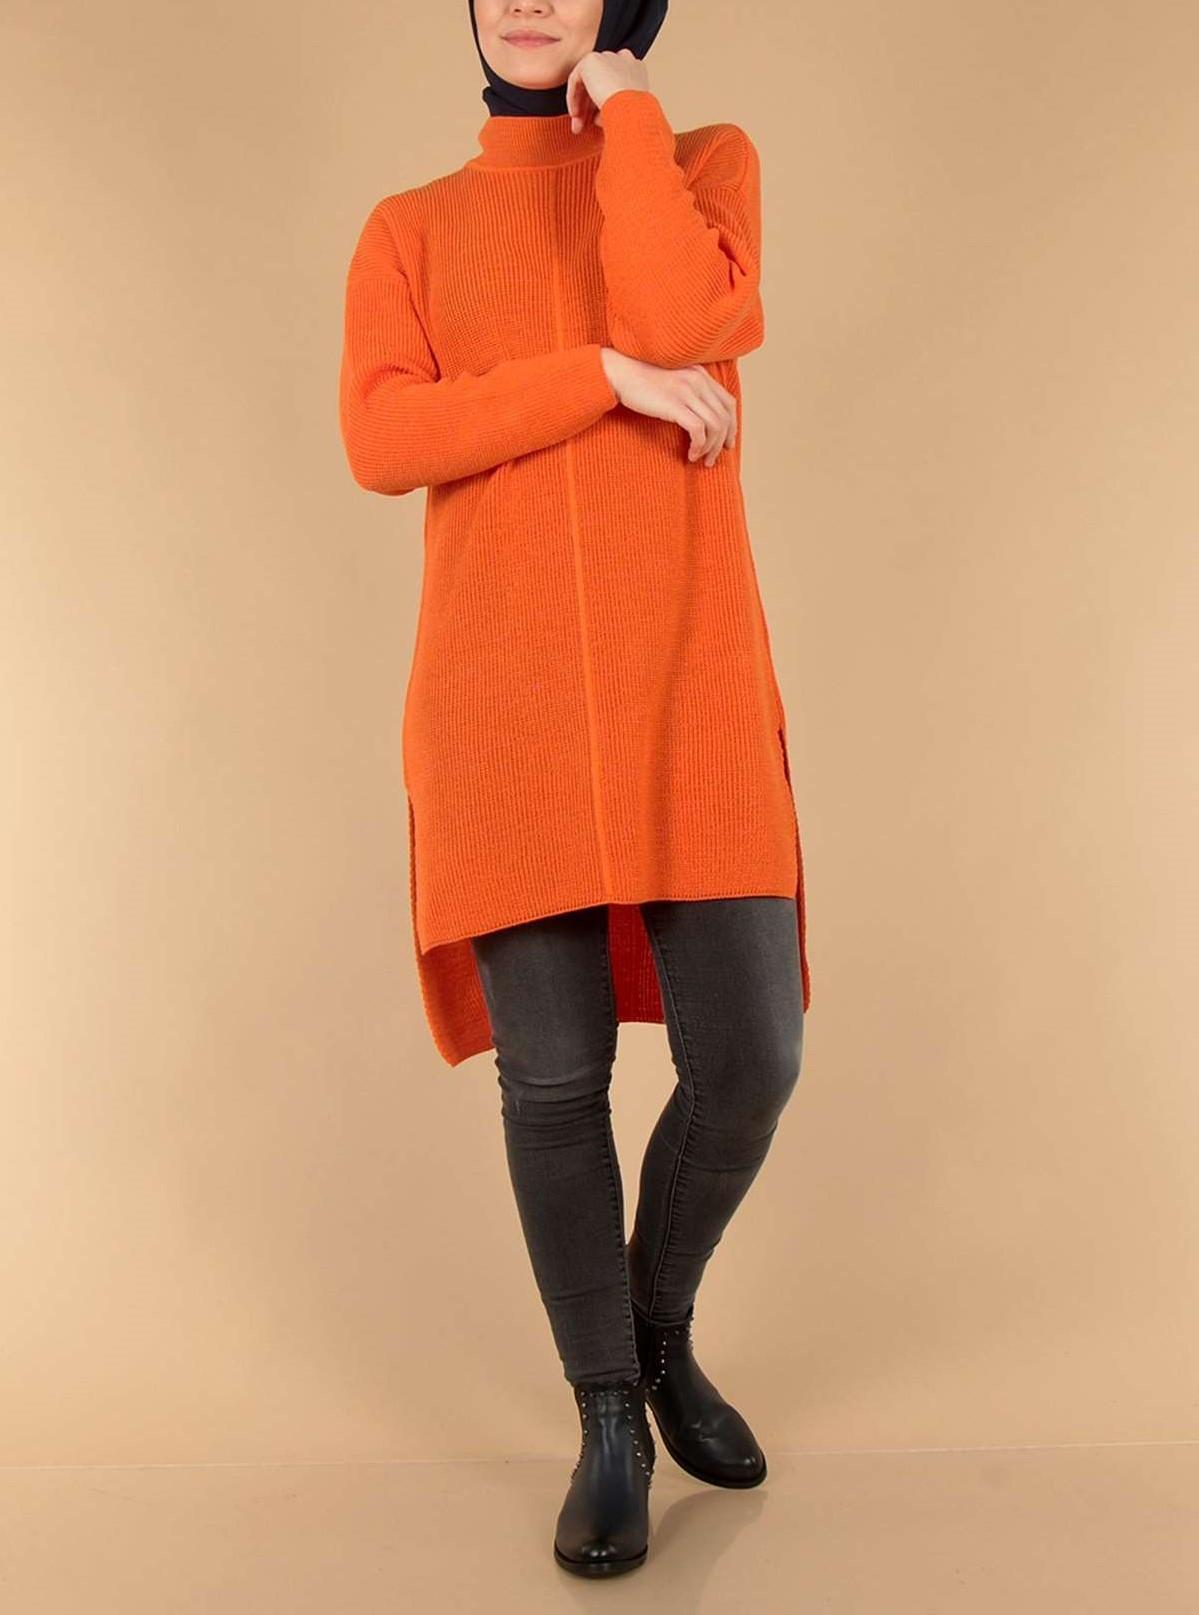 مدل تونیک بافتنی دخترانه نارنجی 98